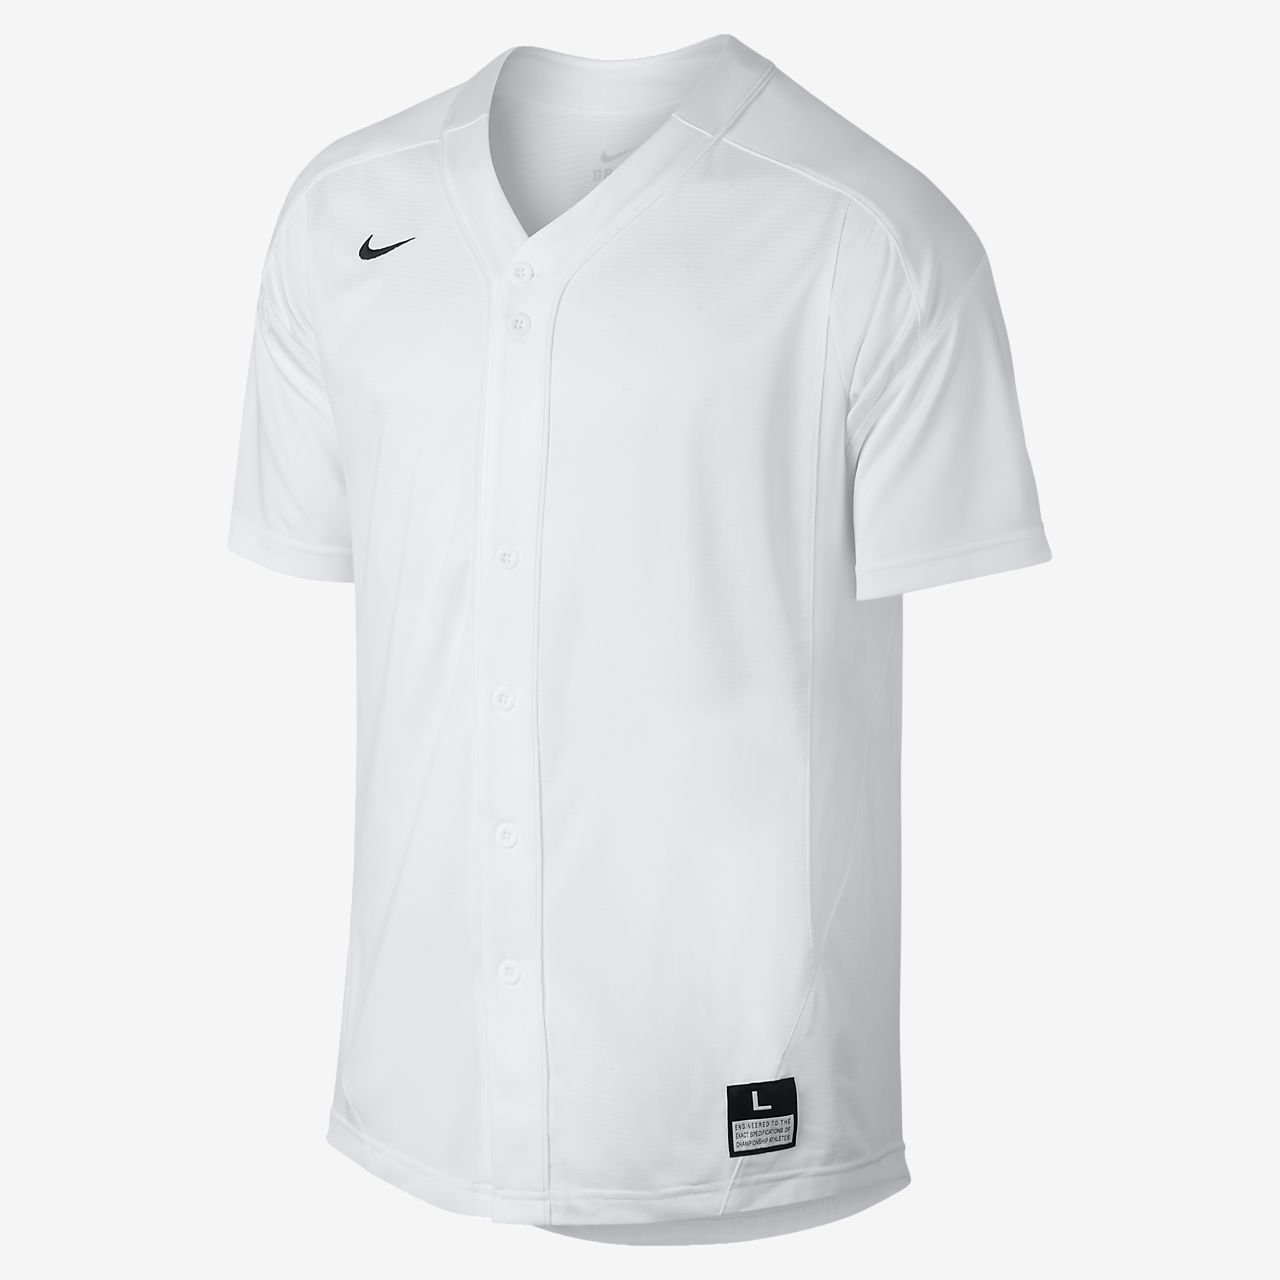 Nike Vapor Dinger Men s Baseball Jersey. Nike.com 8b87abdcad84